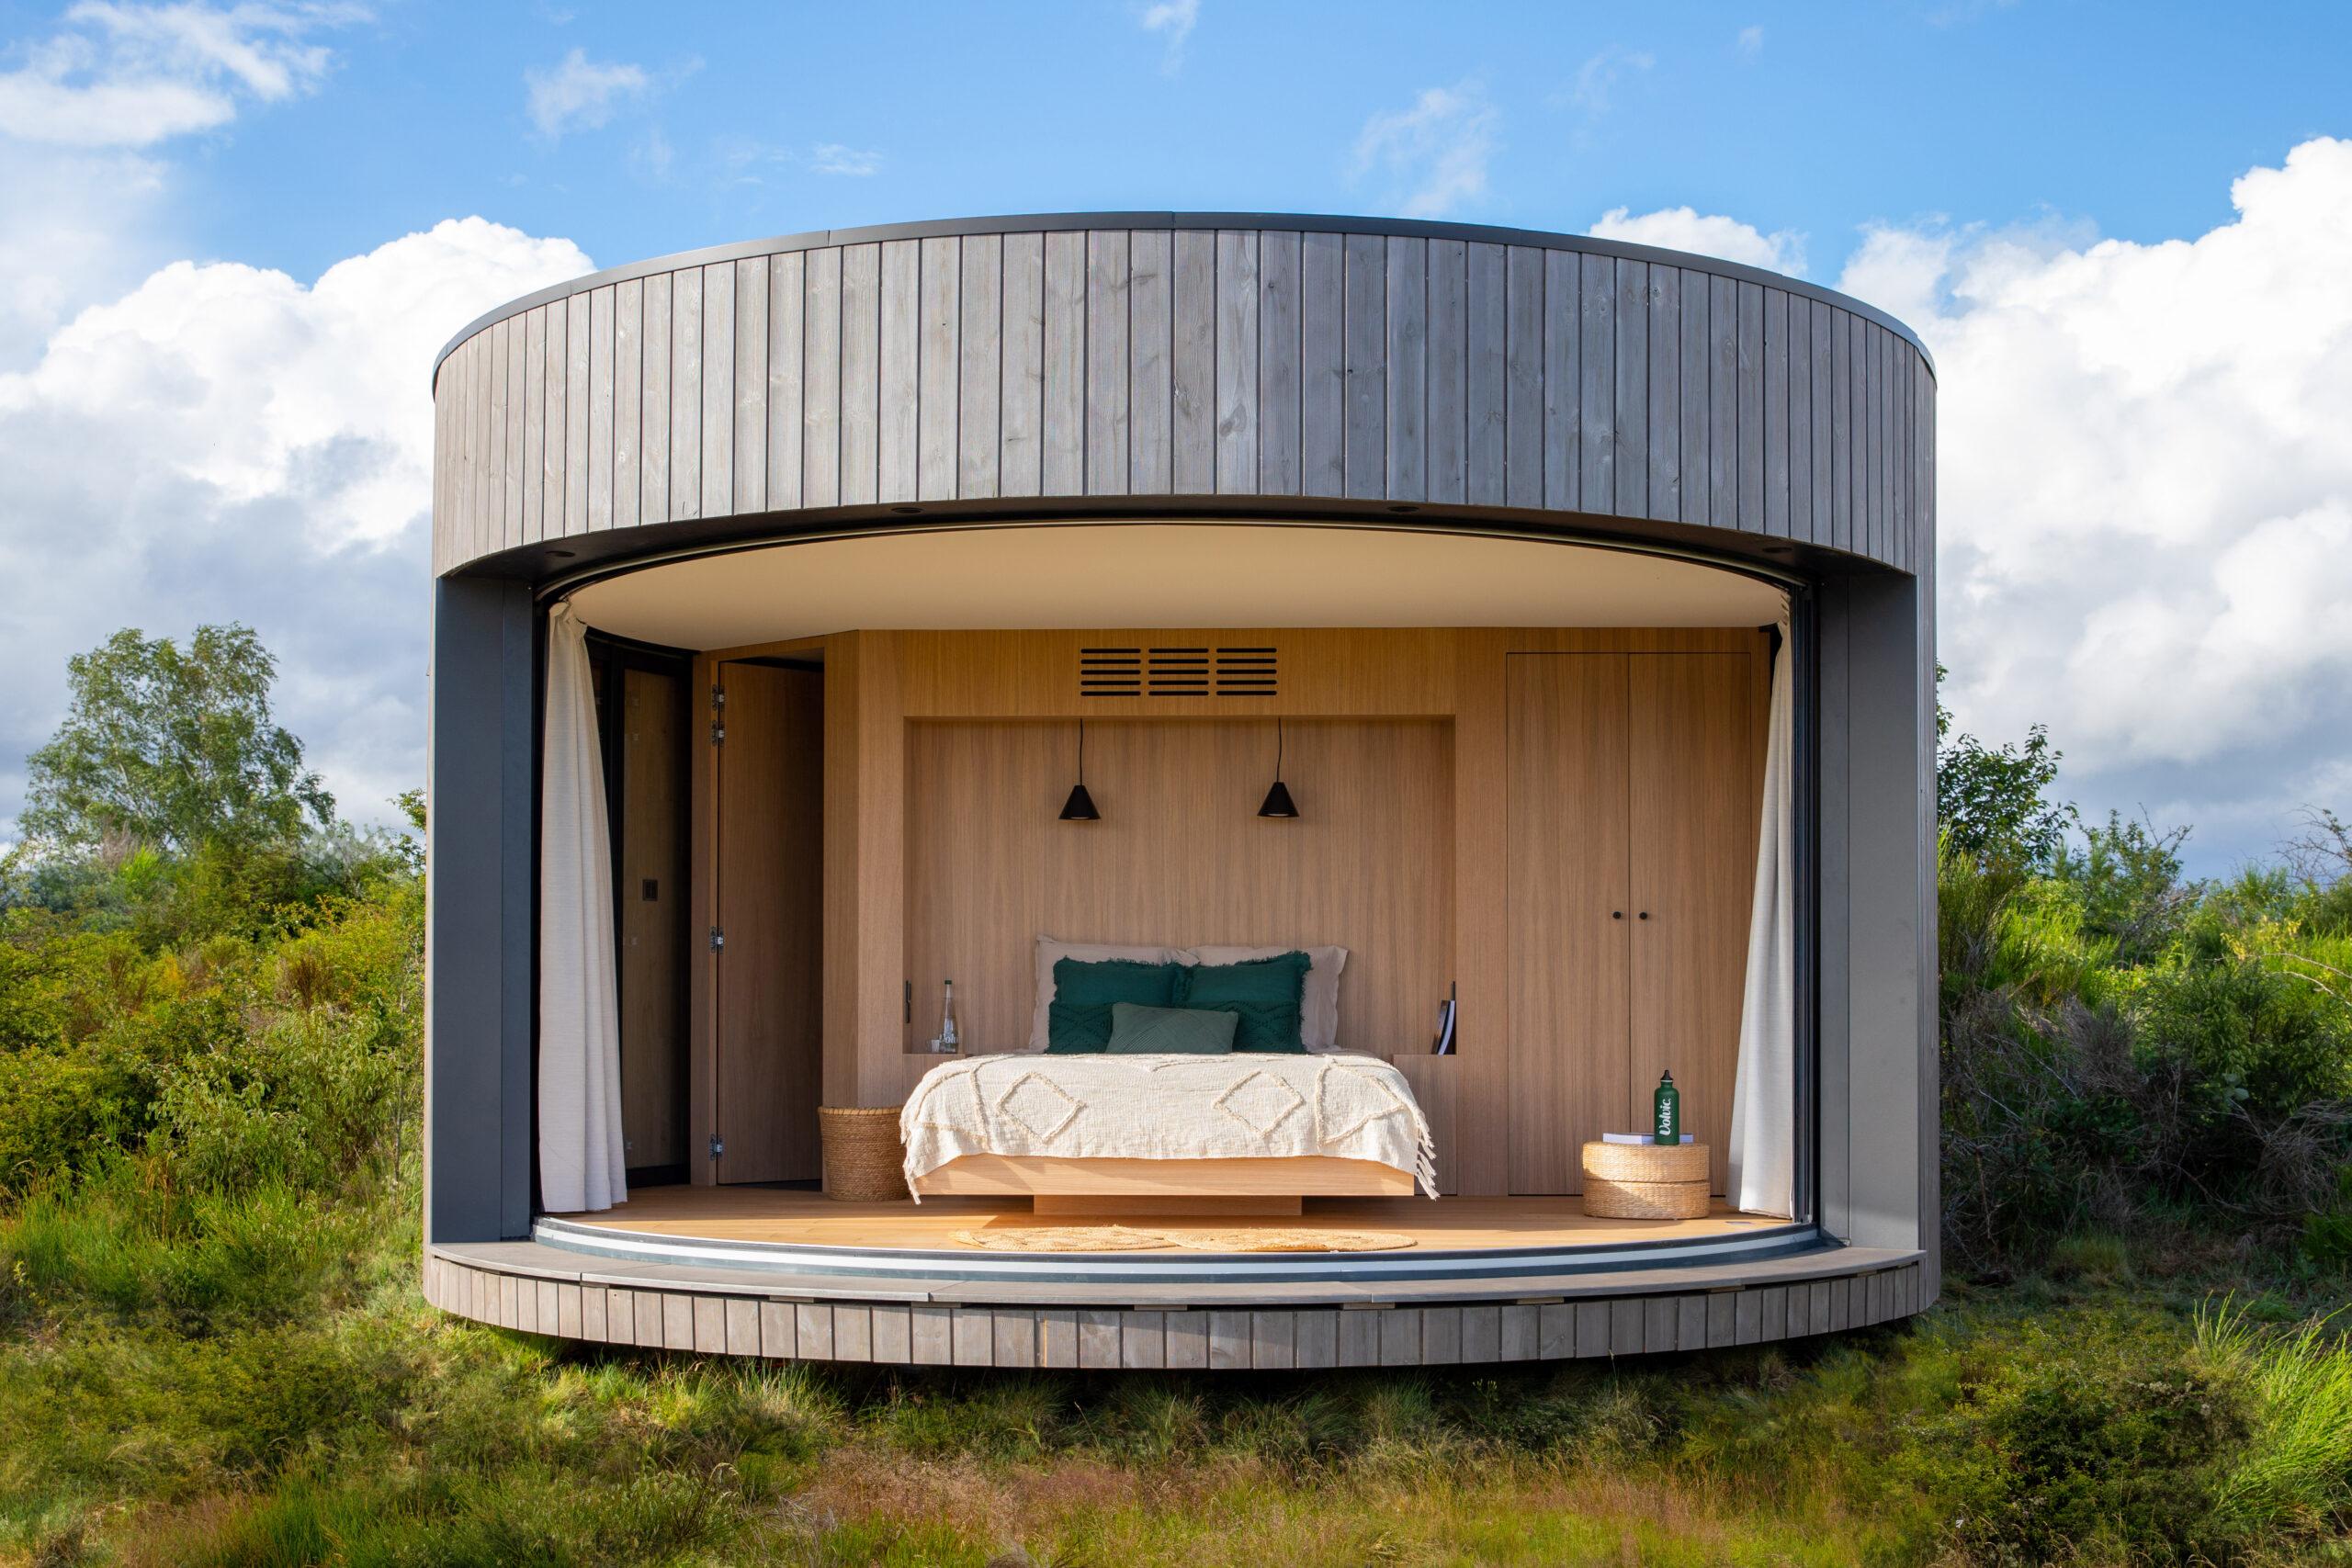 Volvic x Airbnb